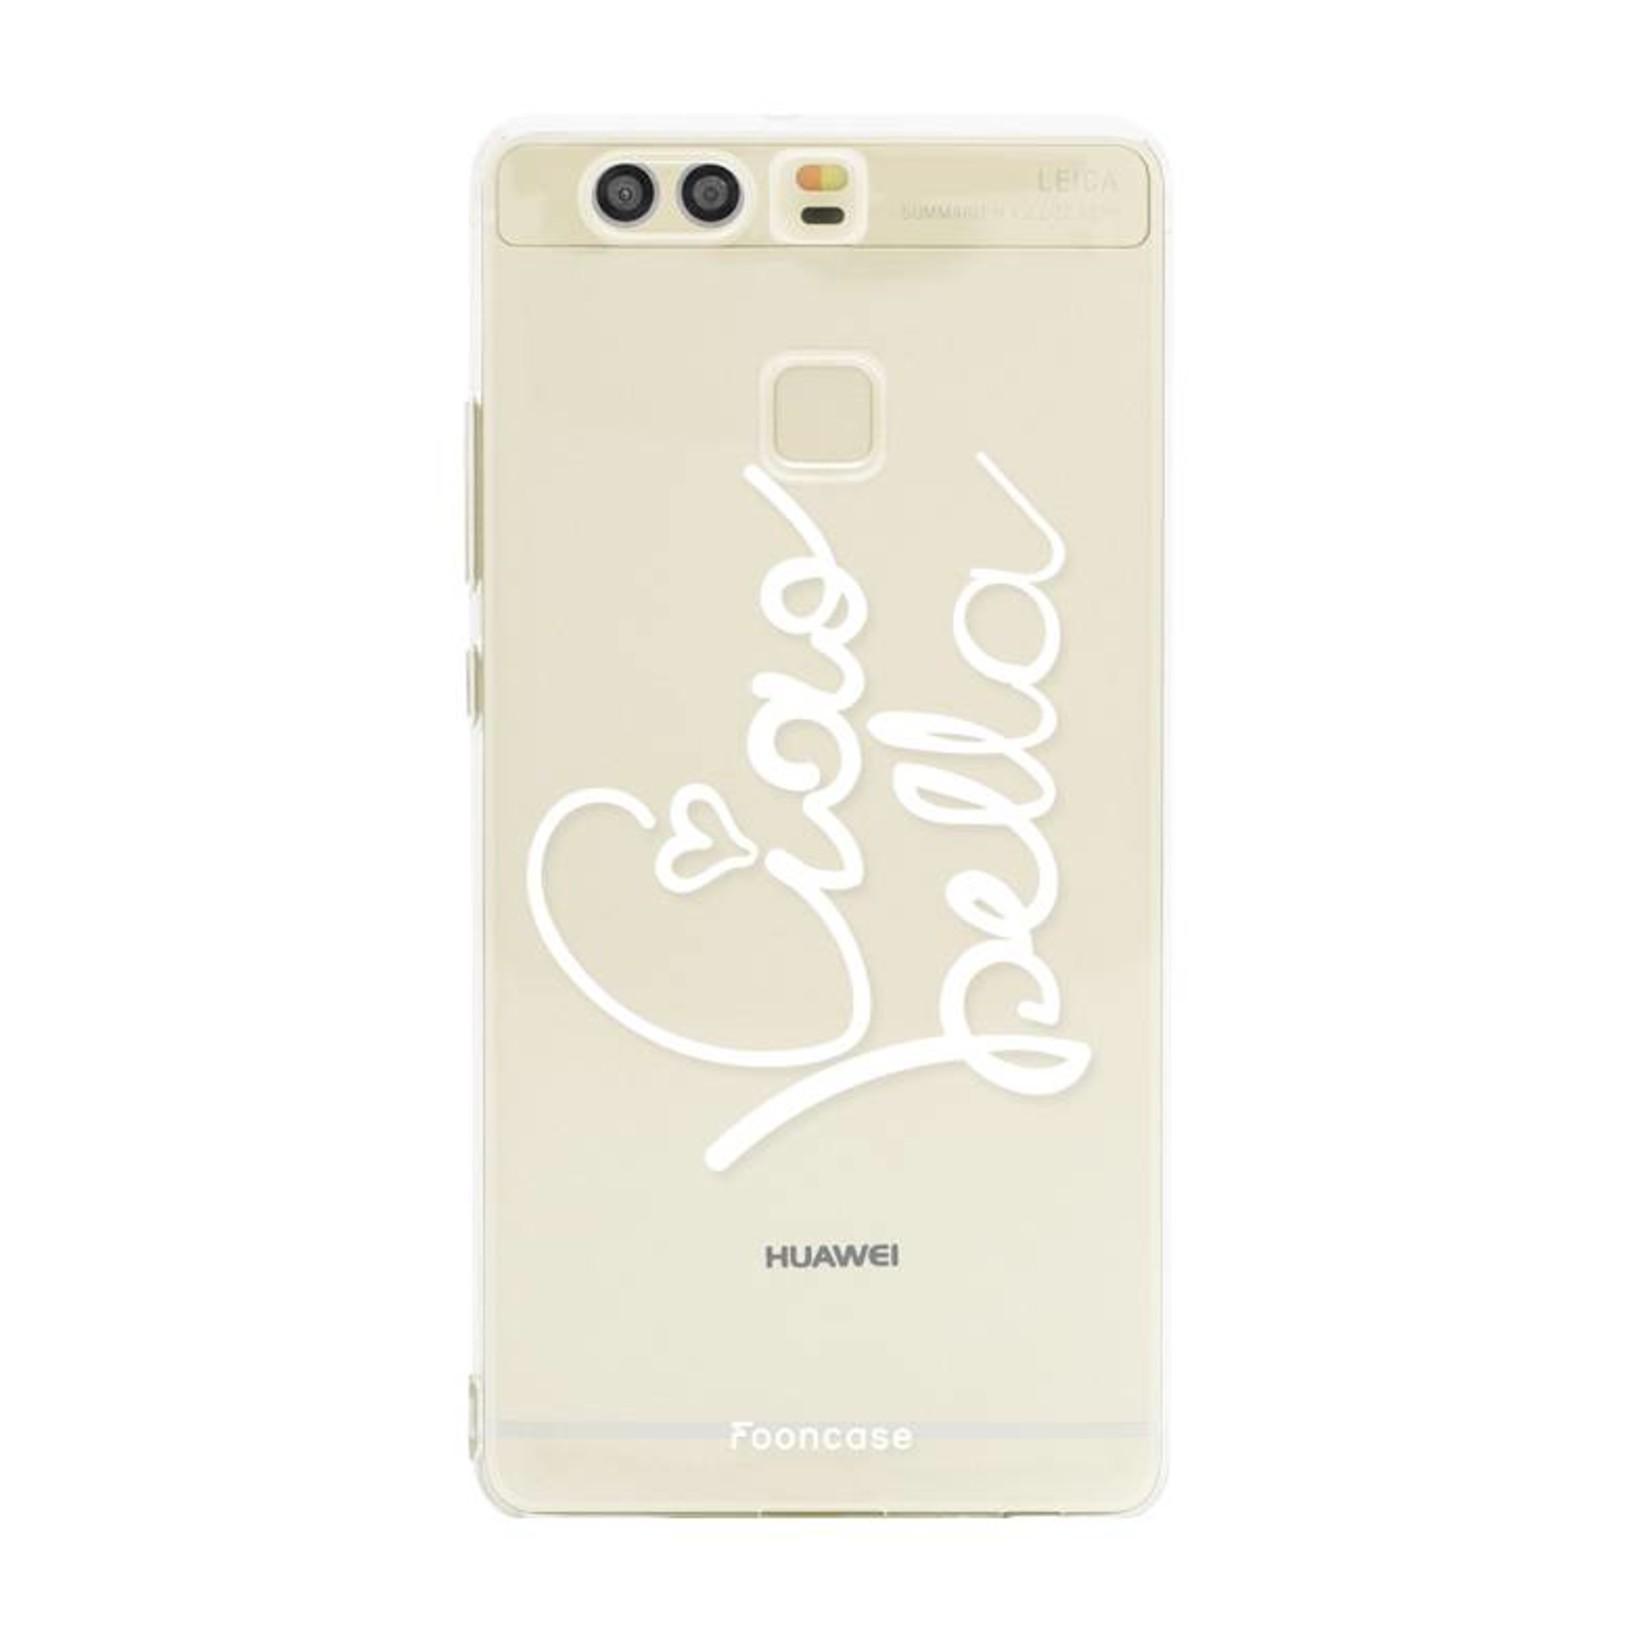 FOONCASE Huawei P9 hoesje TPU Soft Case - Back Cover - Ciao Bella!